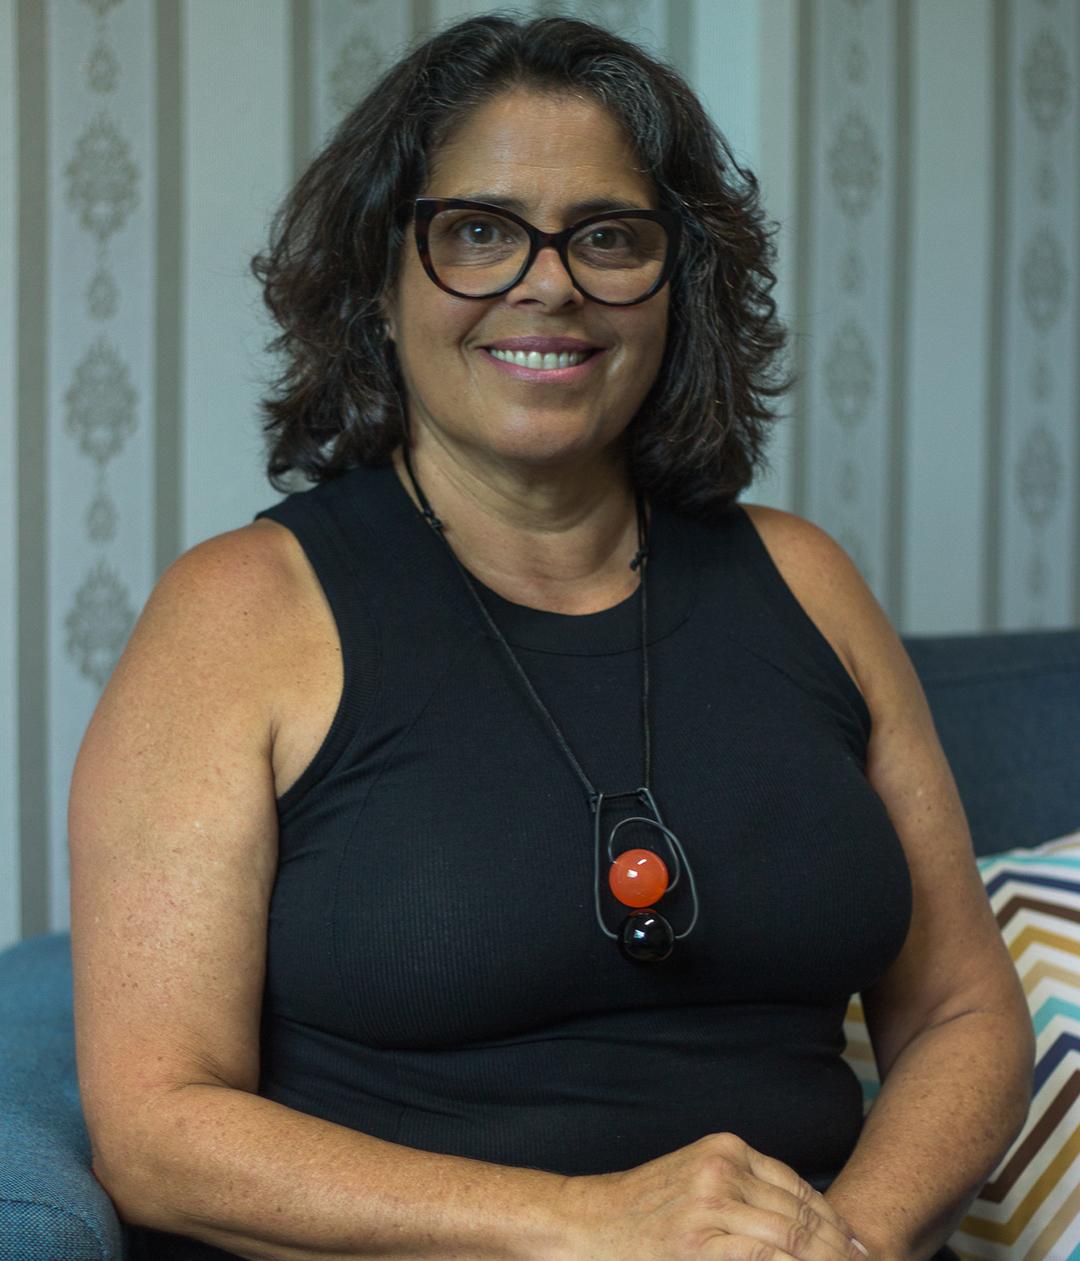 Ana Maria Velloso Coutinho Lobo, Psicóloga, CRP: 06/157490